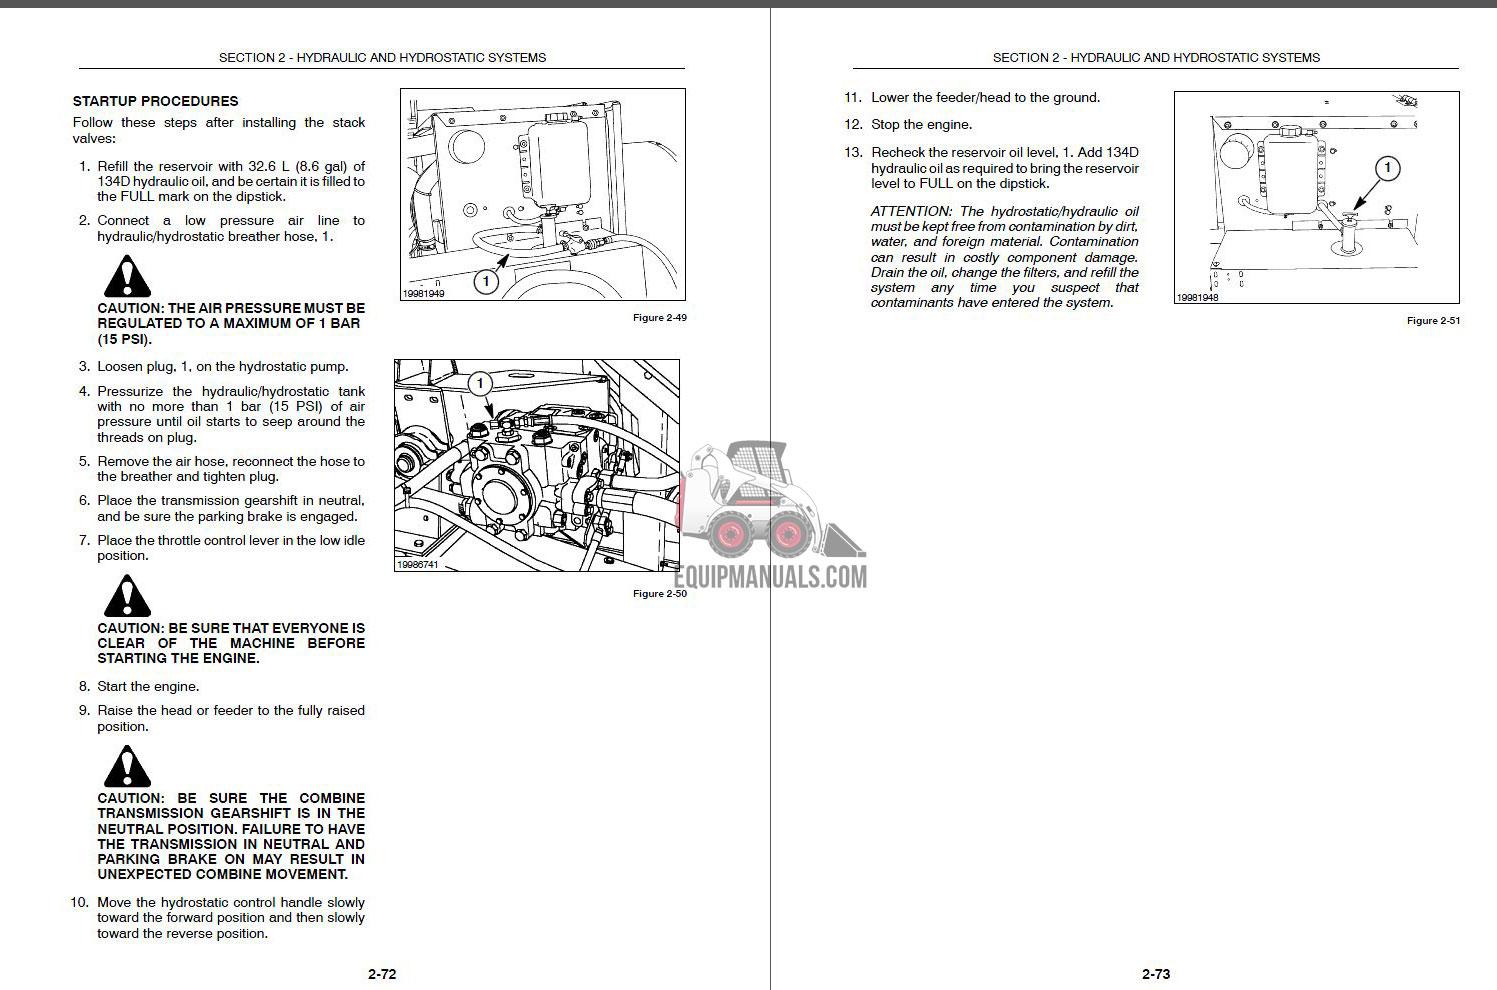 Solar Combiner Schematic Manual Guide